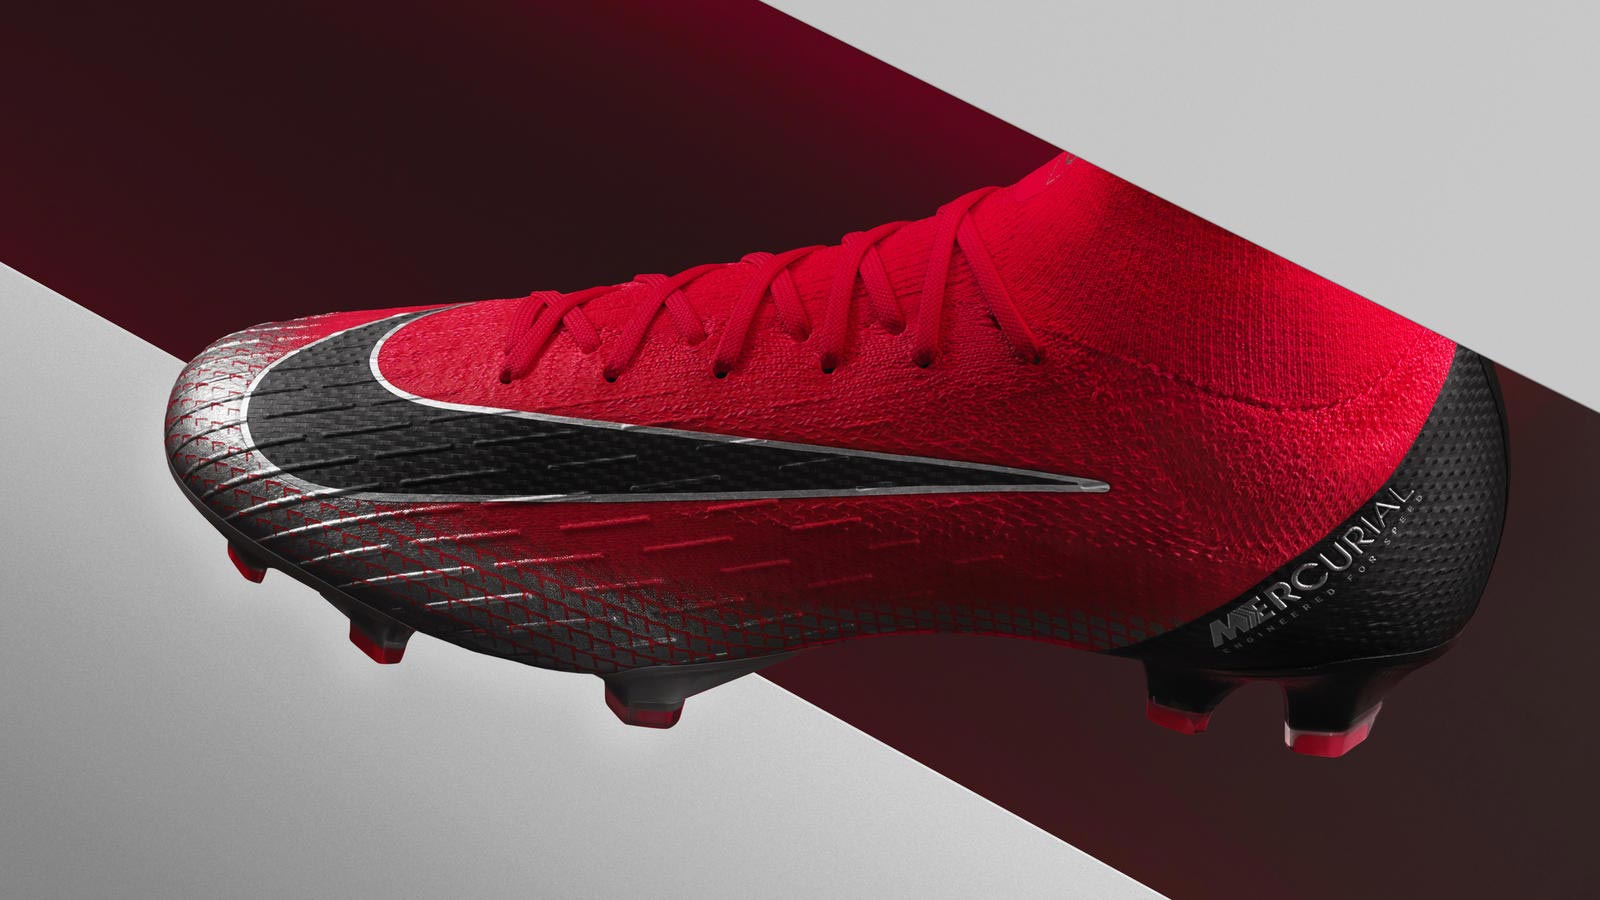 9193b87ca3e6 Final Chapter': Nike Mercurial Superfly 360 Cristiano Ronaldo ...